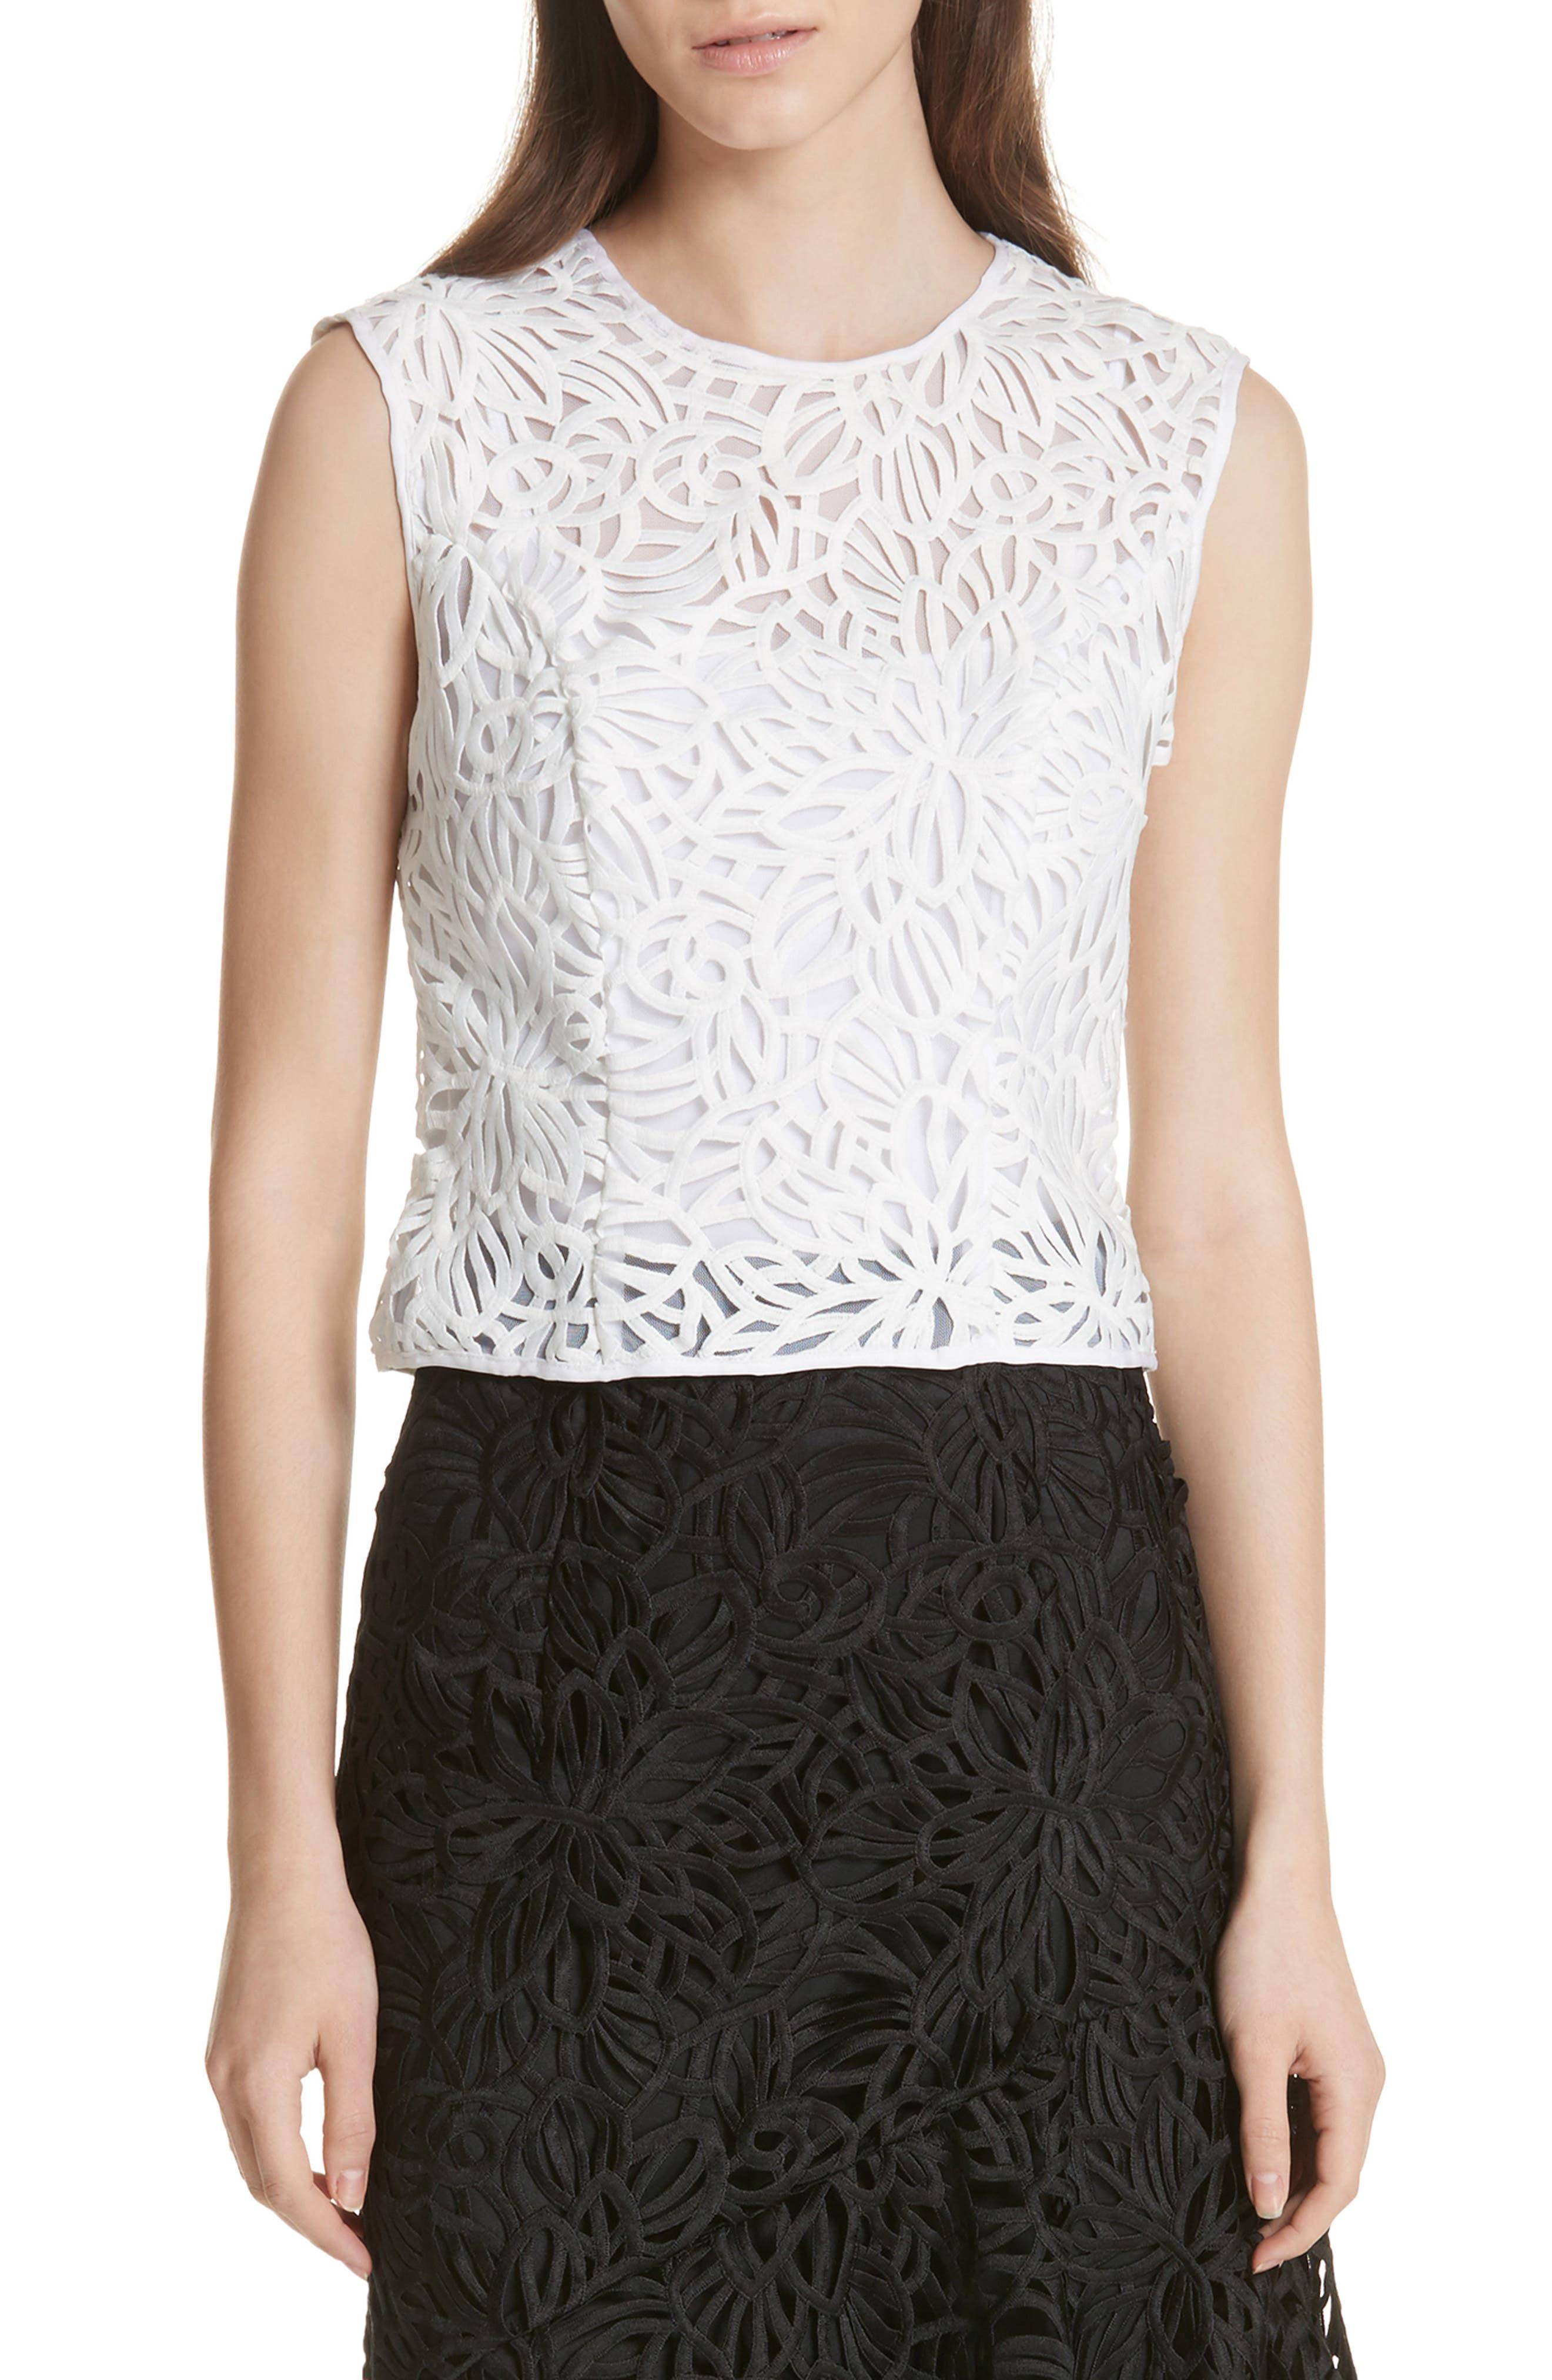 Irena Lace Top,                         Main,                         color, White